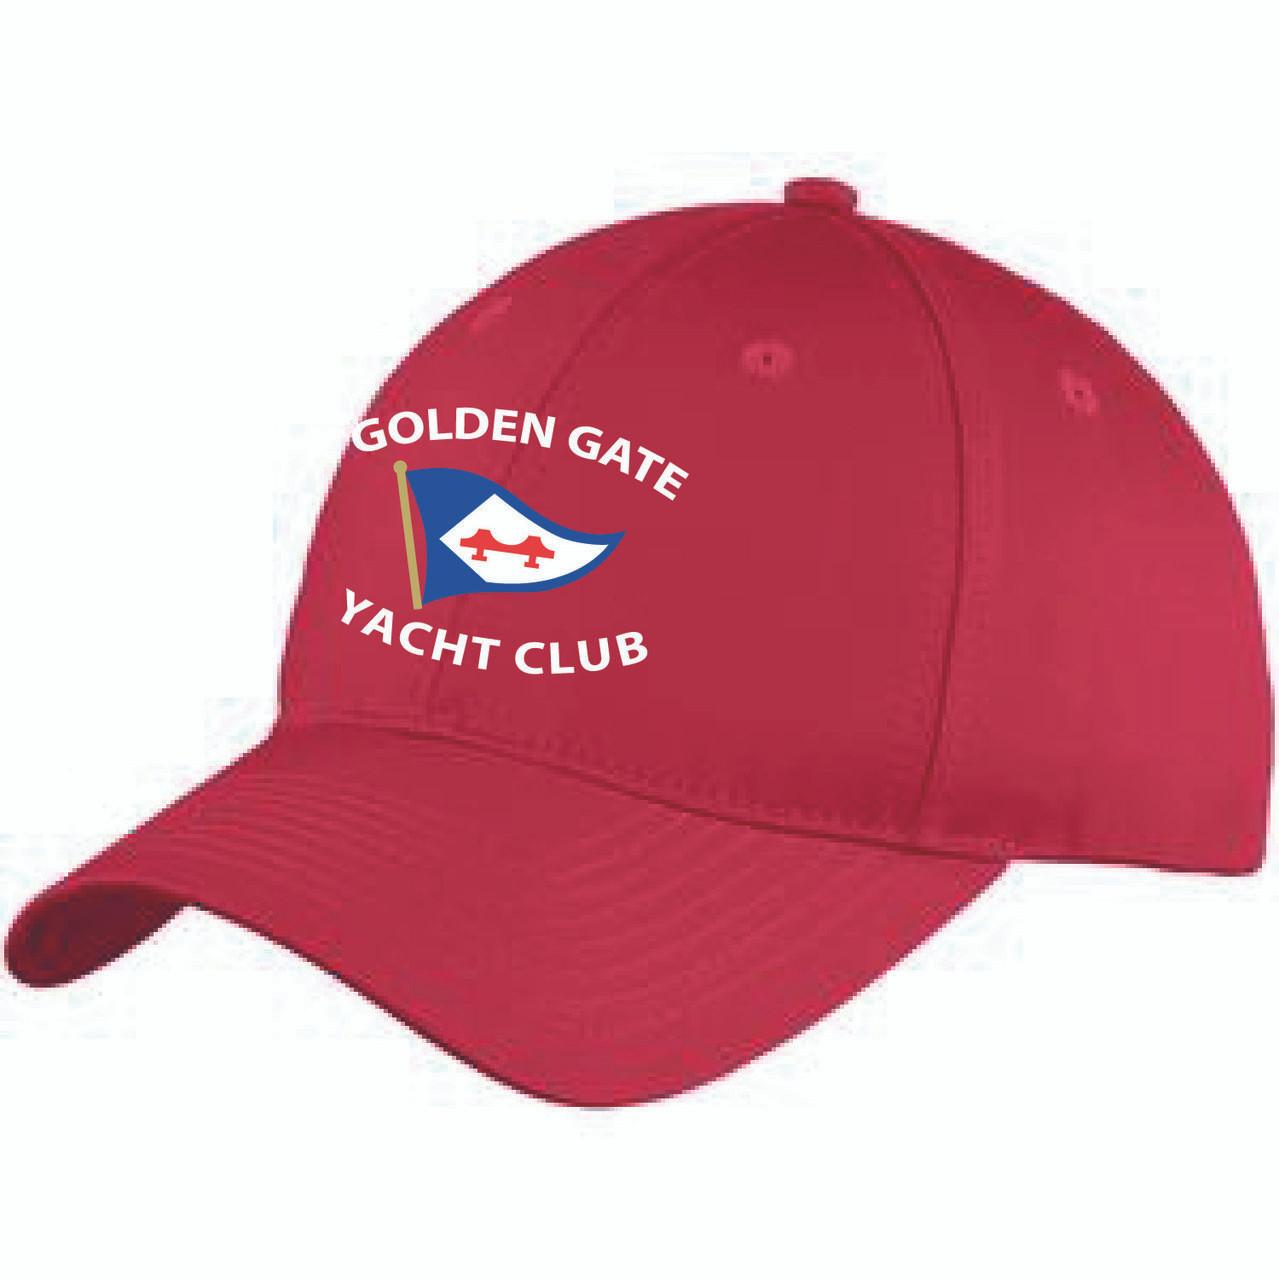 ece531f85 SALE! Golden Gate Yacht Club Cotton Twill Cap